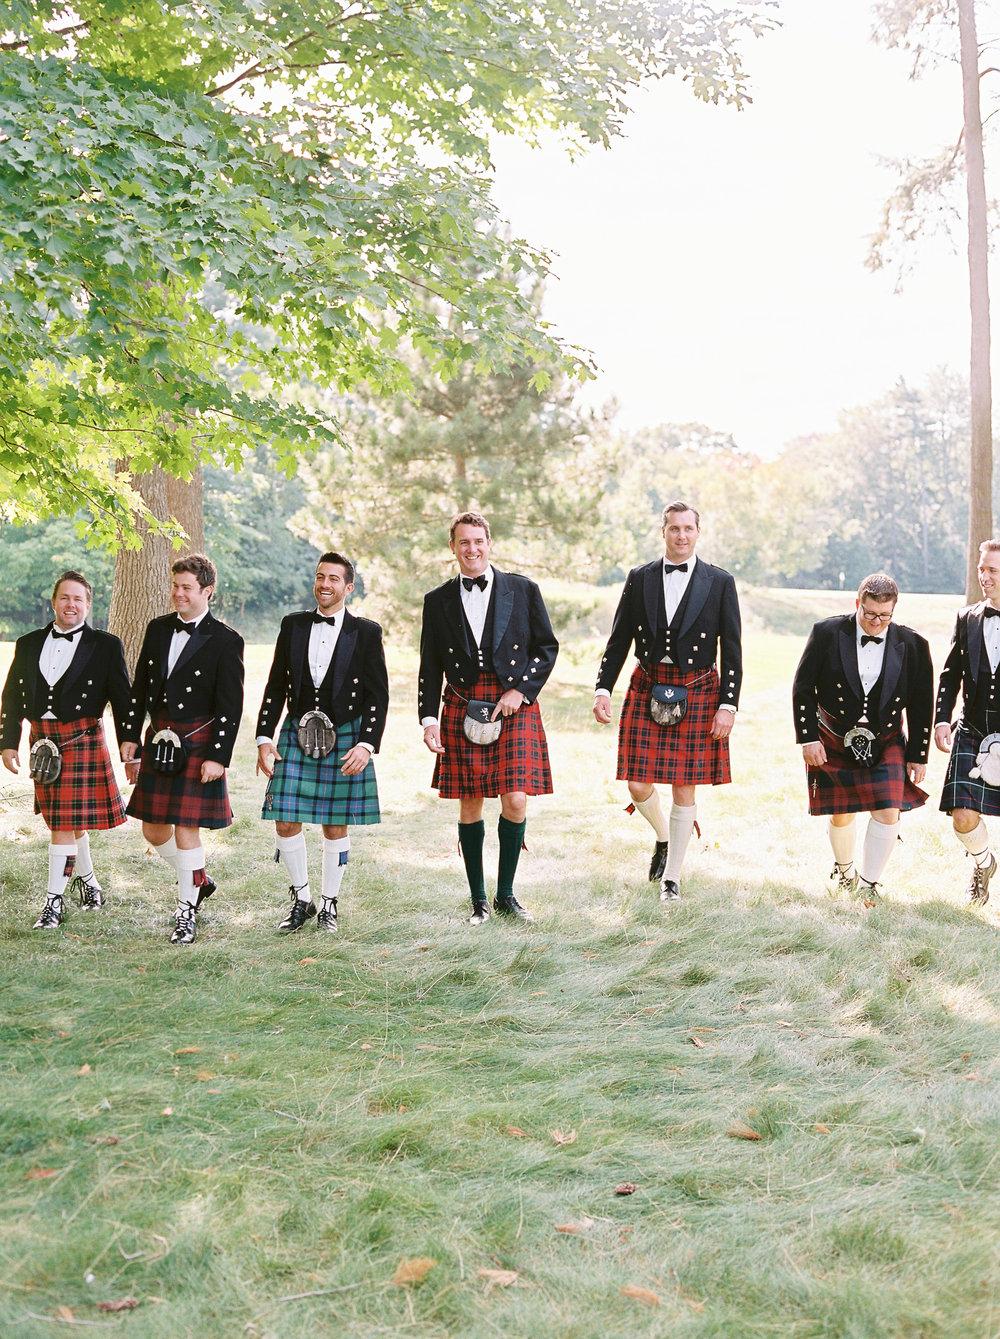 0171-Geneva-Ian-Wedding-Toronto Golf Club-When He Found Her-TorontoPhotographer.jpg